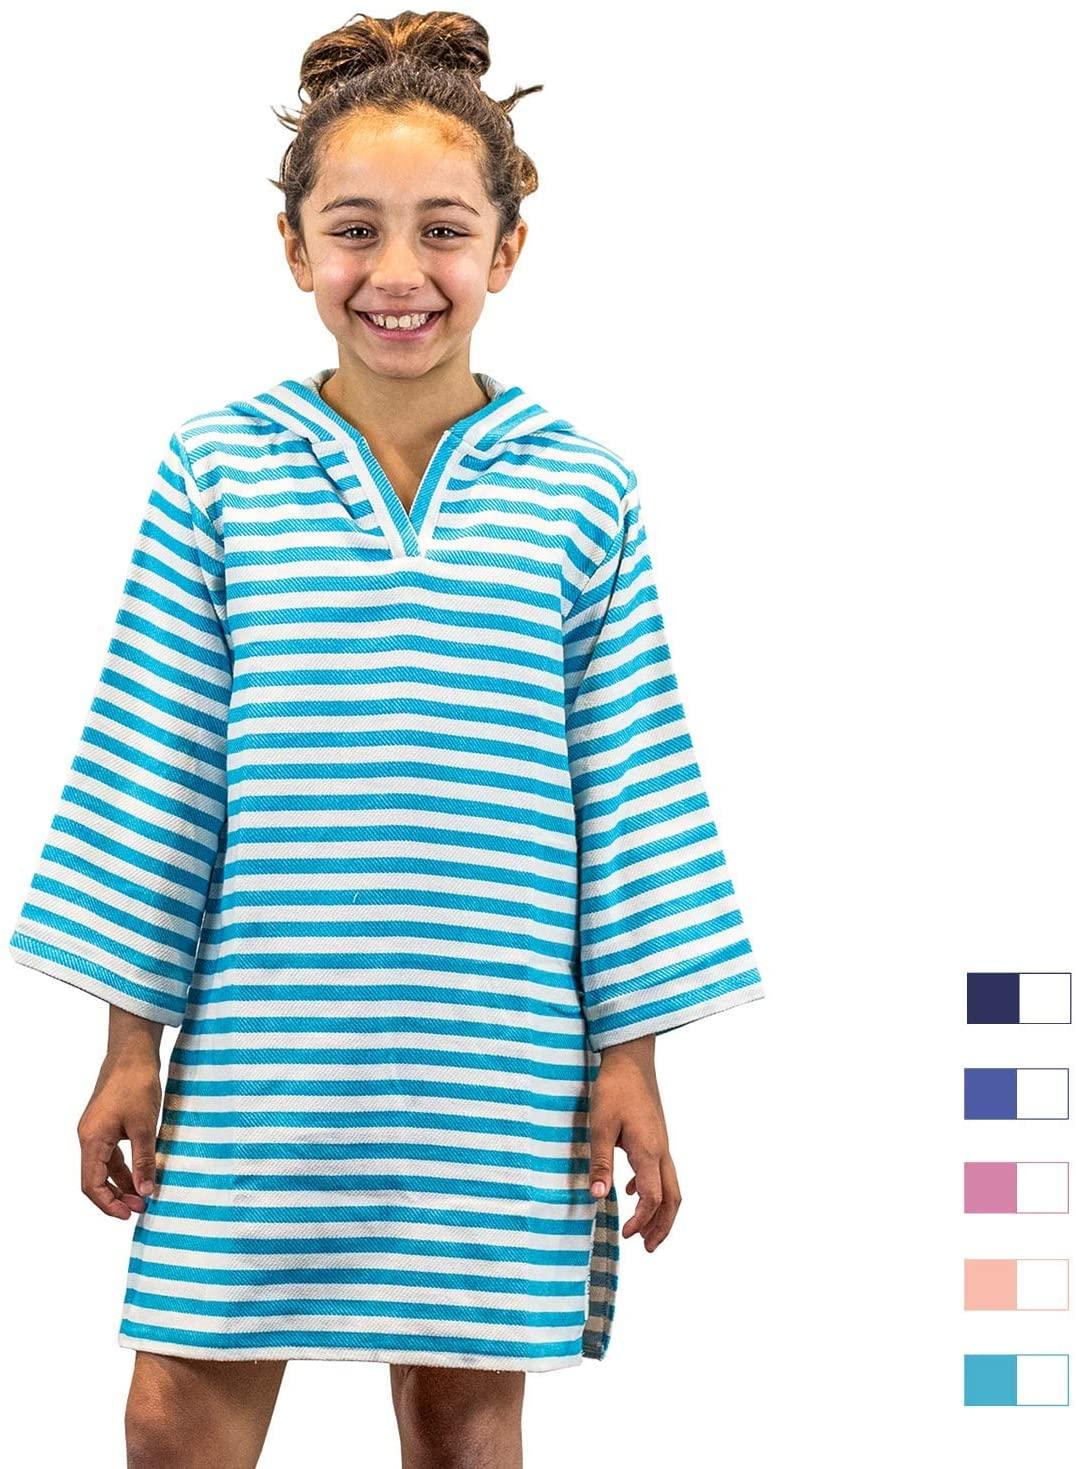 SAMMIMIS Kids Hooded Towel Cover Up, 100% Turkish Cotton, Premium Quality S Aqua/White